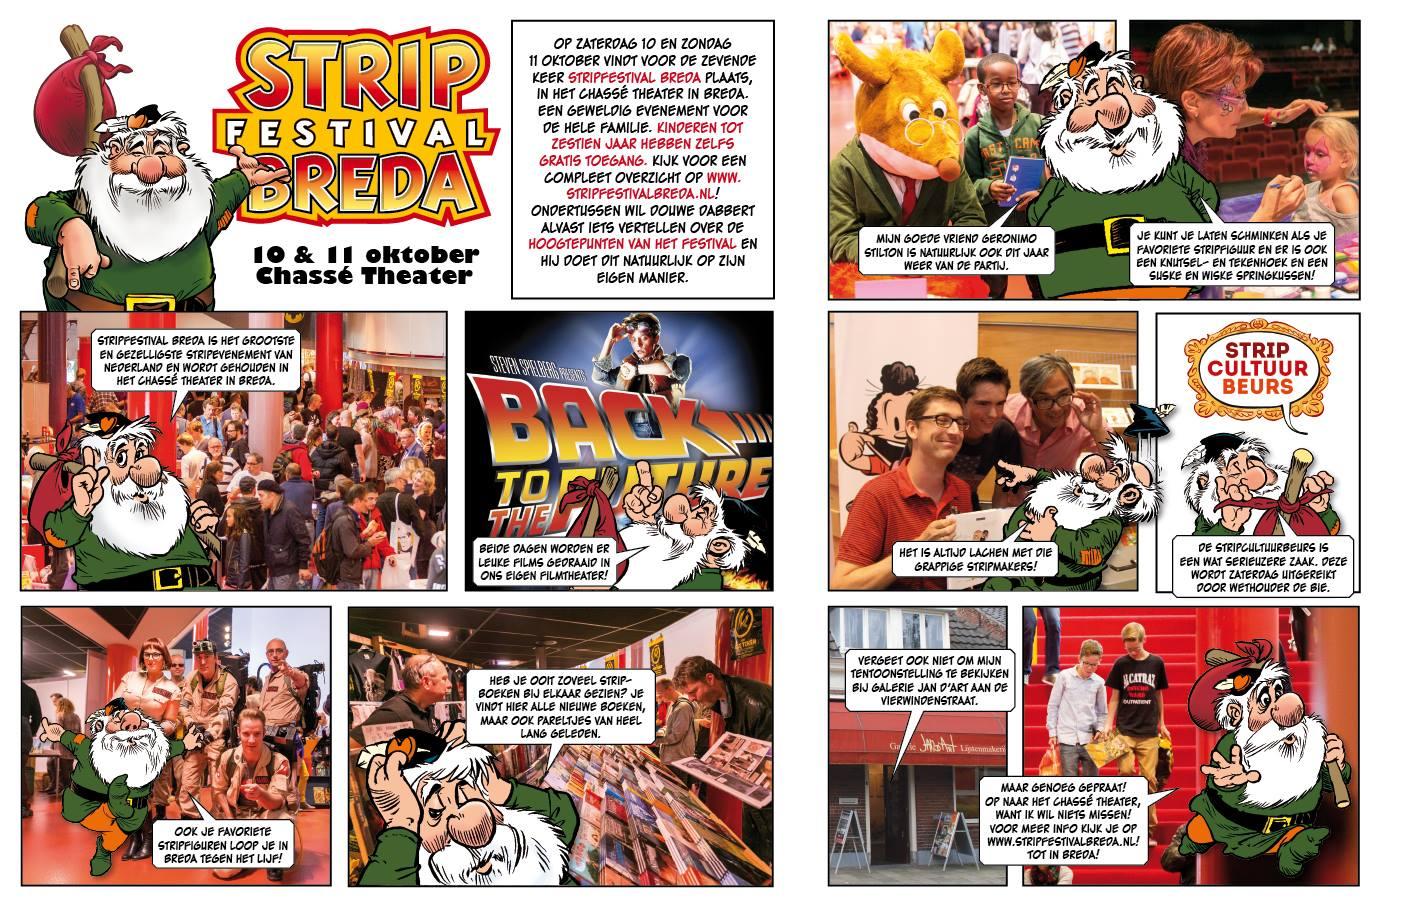 stripfestival_breda_2015